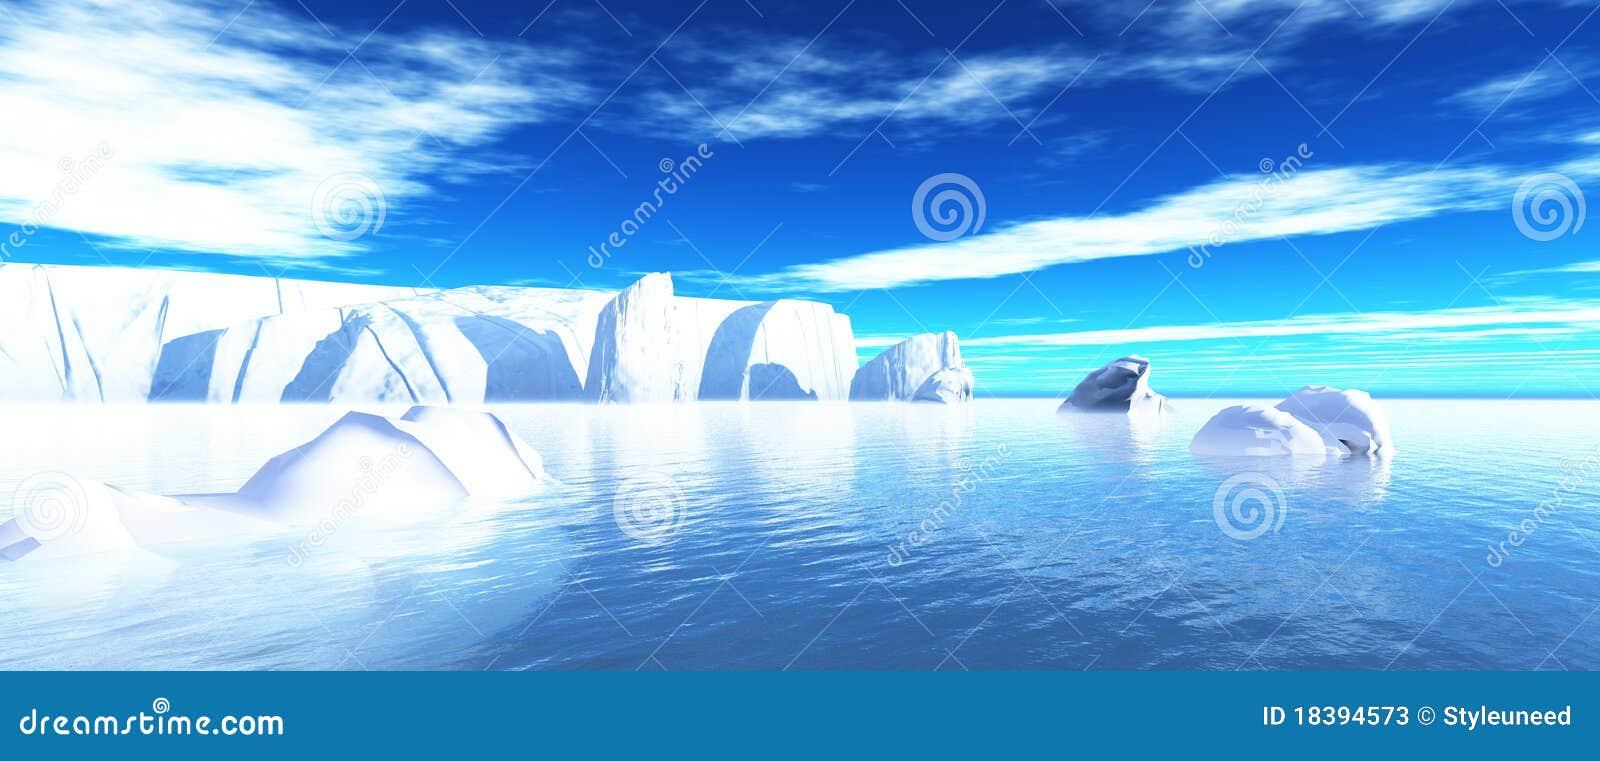 вода 02 айсбергов